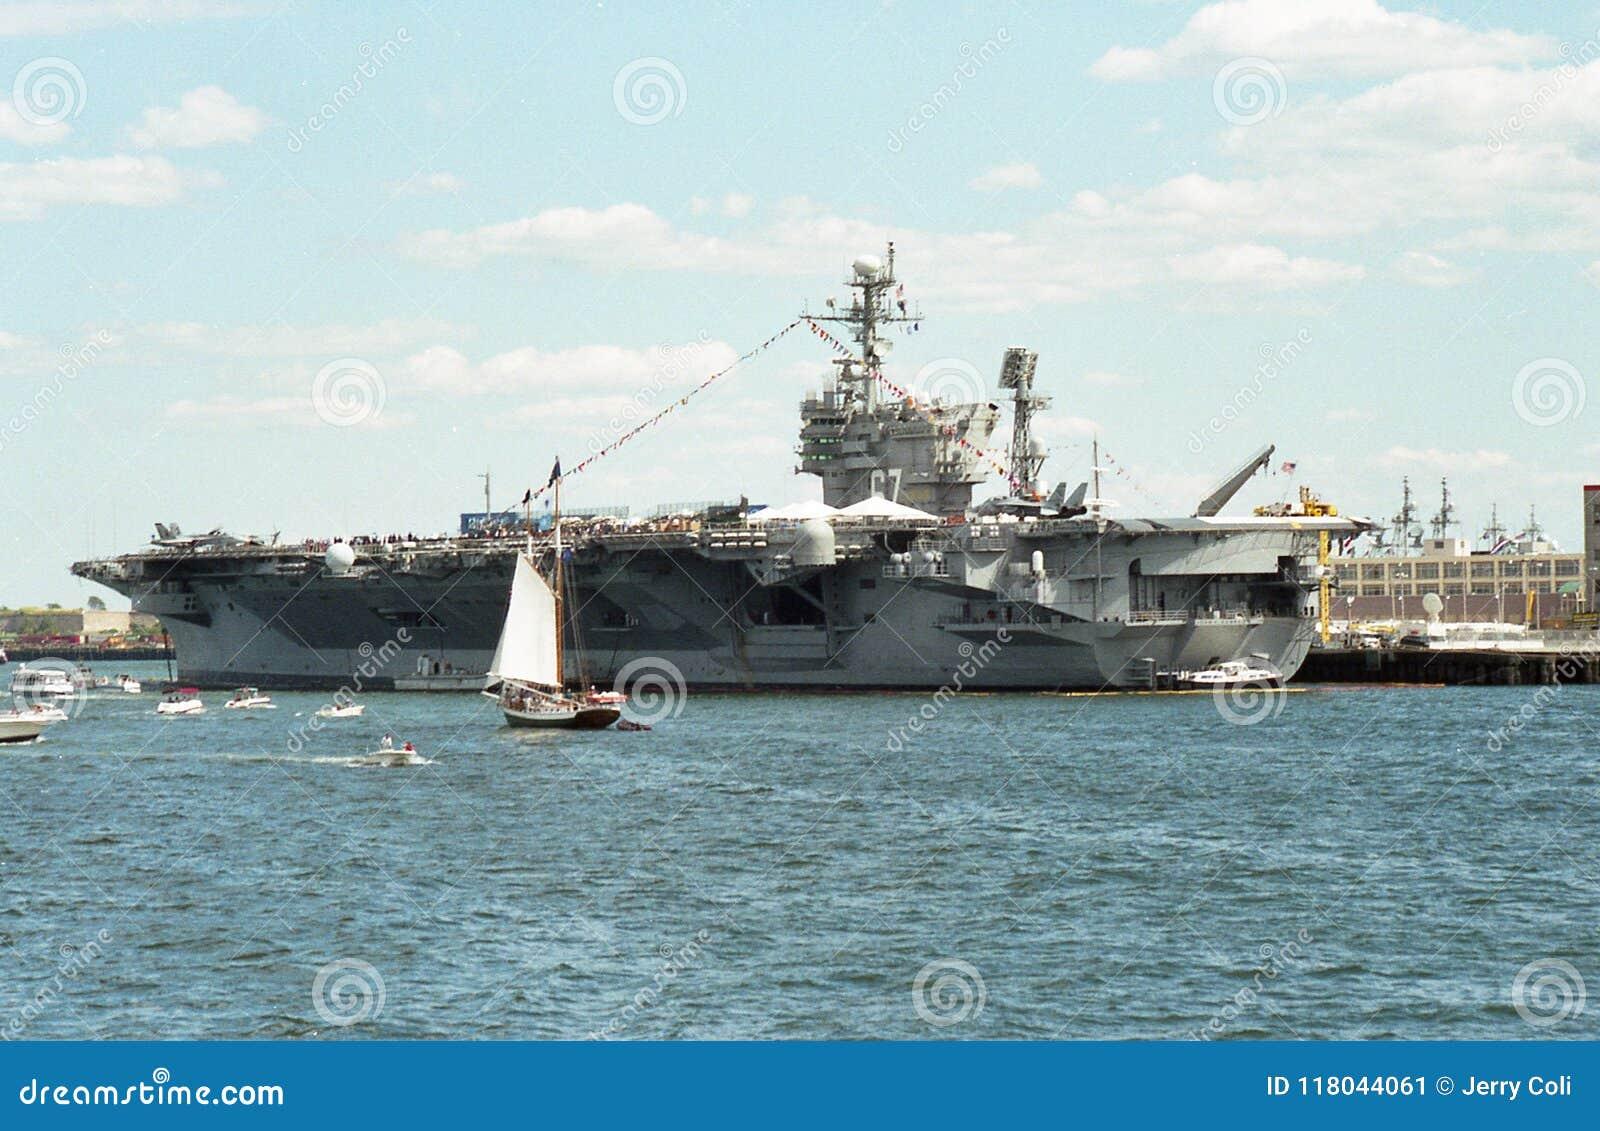 uss john f kennedy cv 67 aircraft carrier editorial photo image